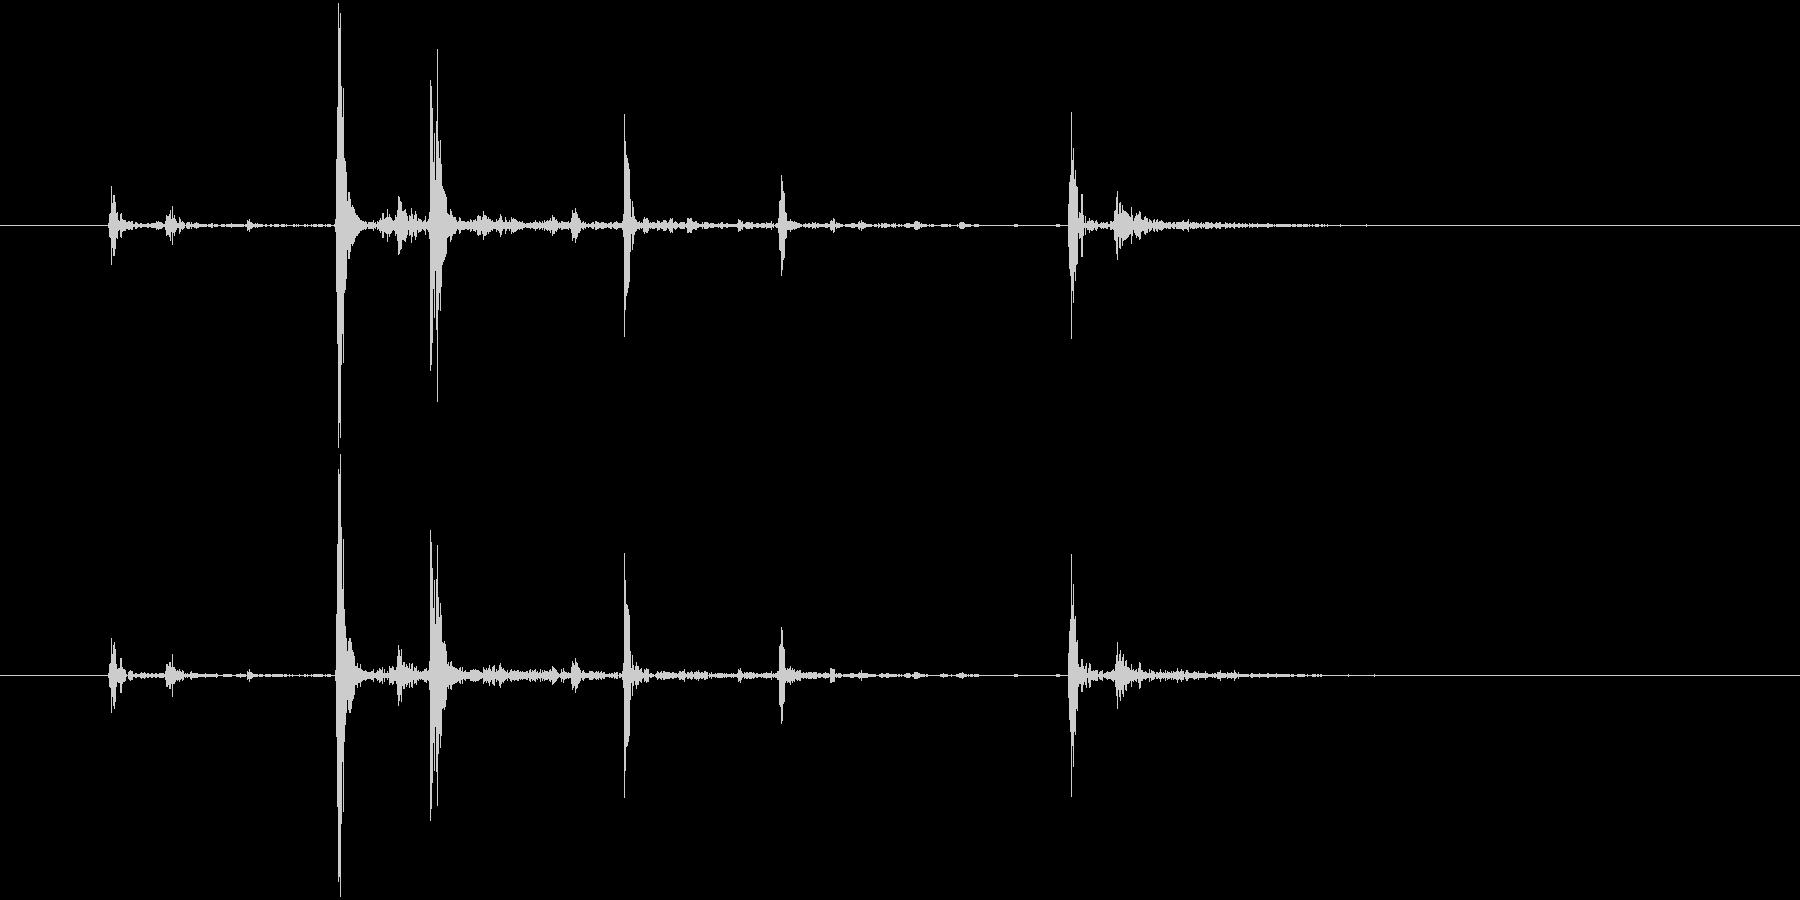 Anime 指の関節を鳴らす音 2の未再生の波形